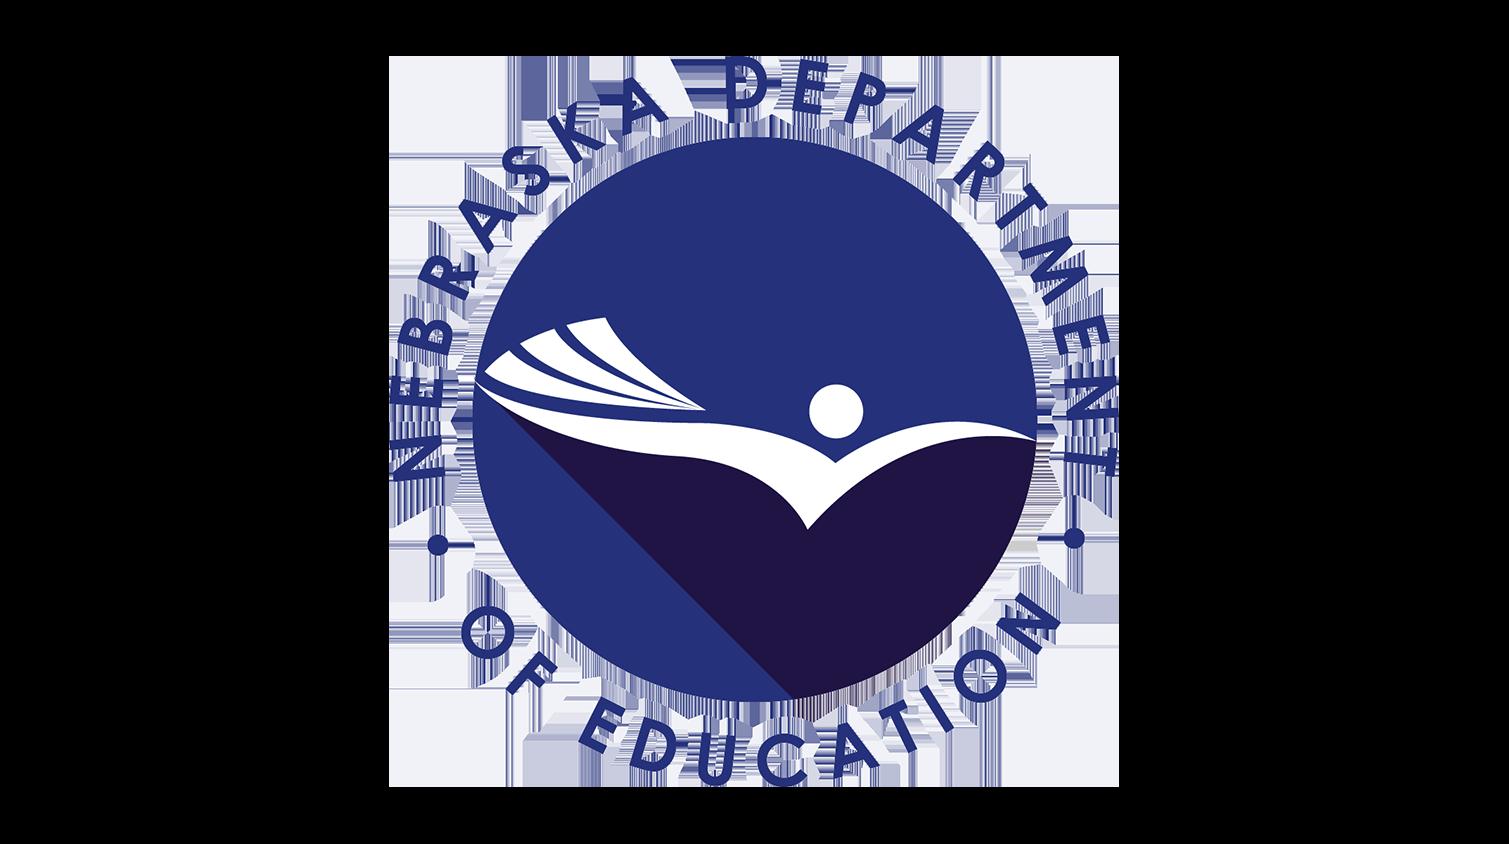 47 Nebraska school districts object to sex ed standards